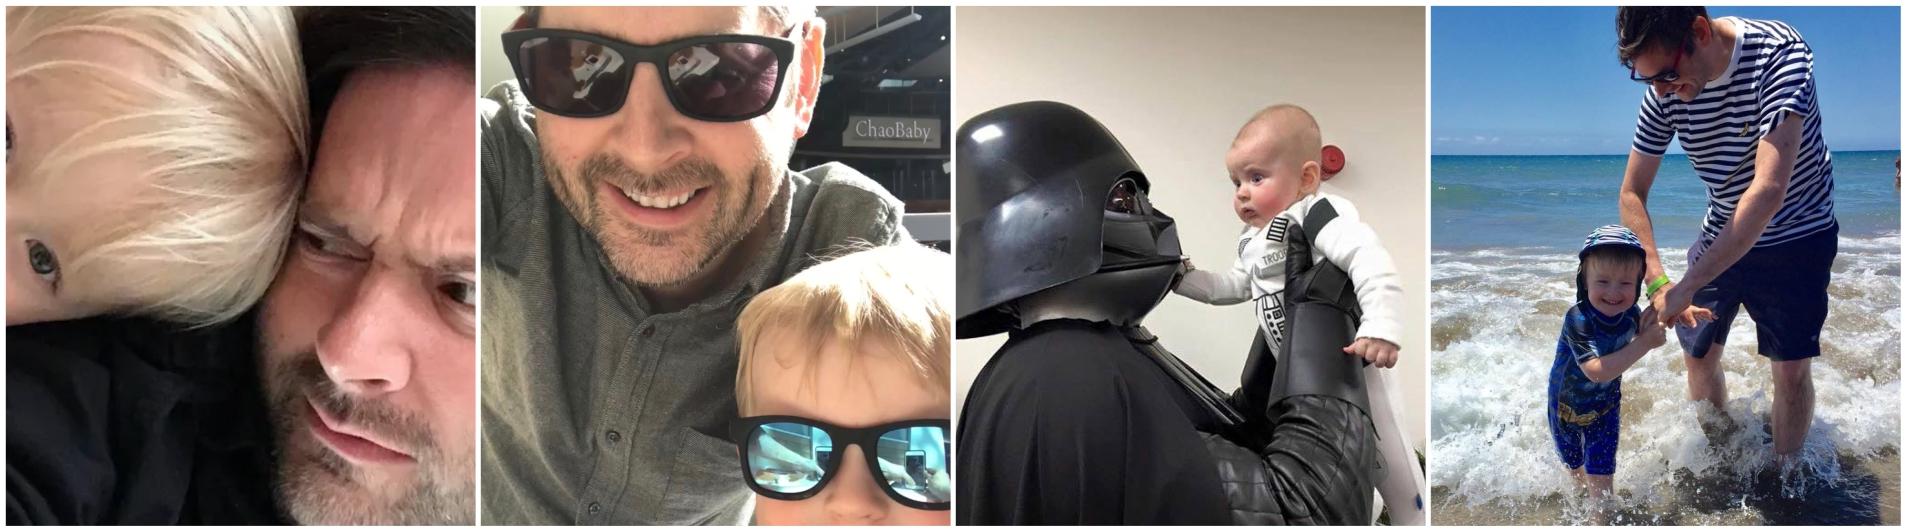 Man vs Baby slider image